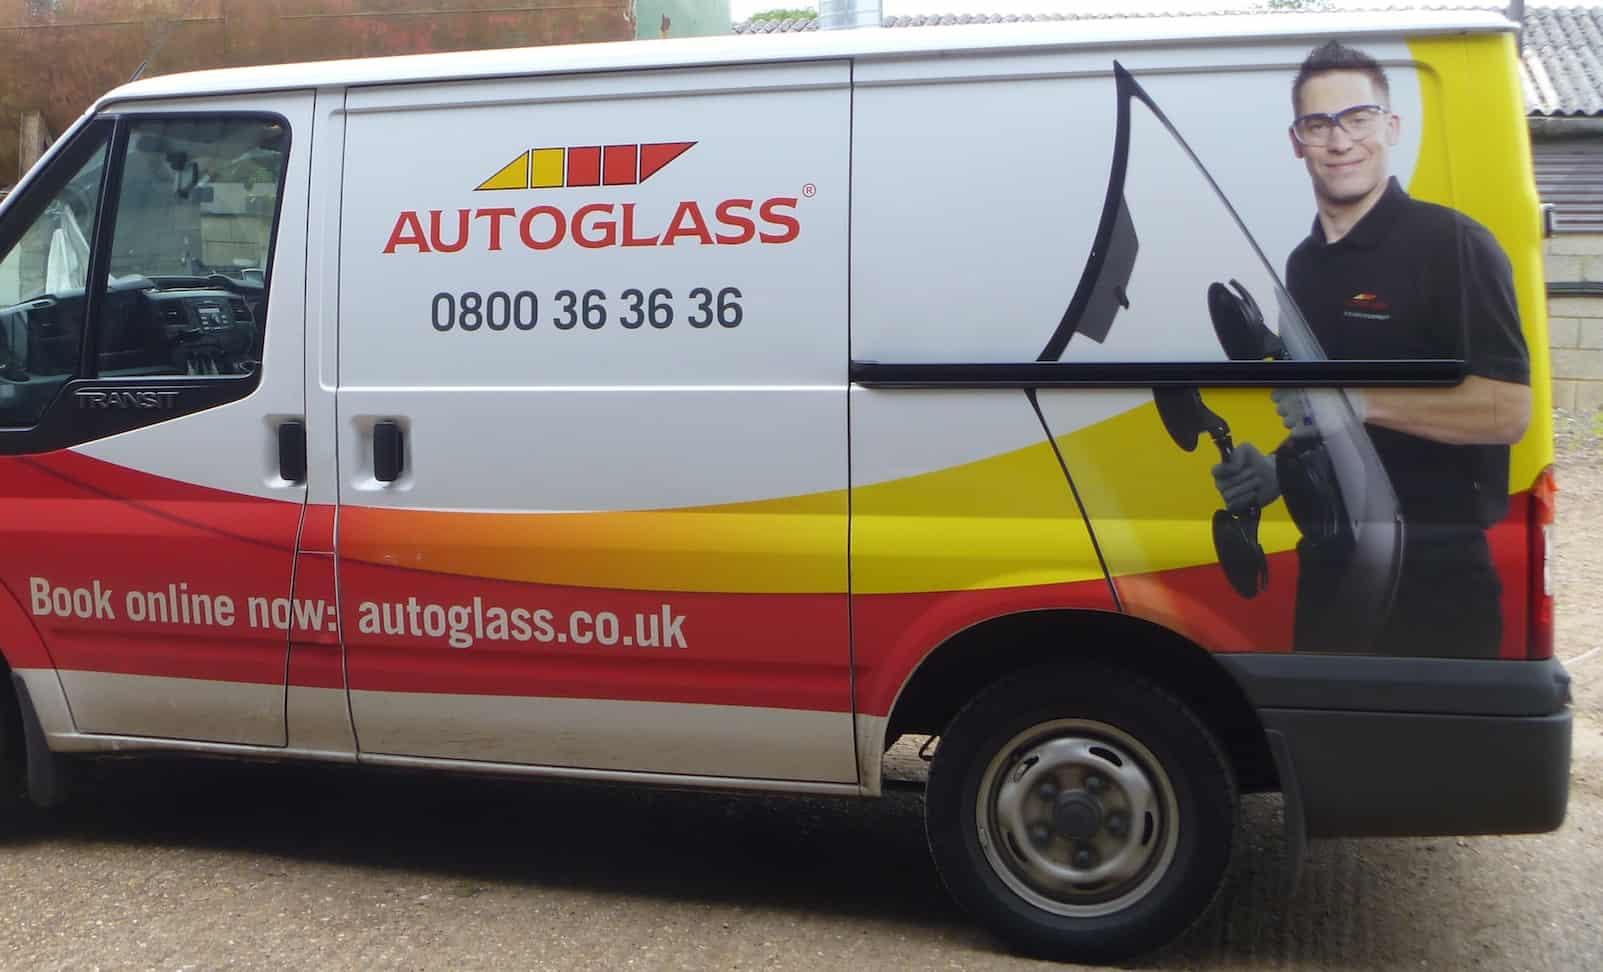 JN Phillips Auto Glass: Windshield replacement, Auto Glass